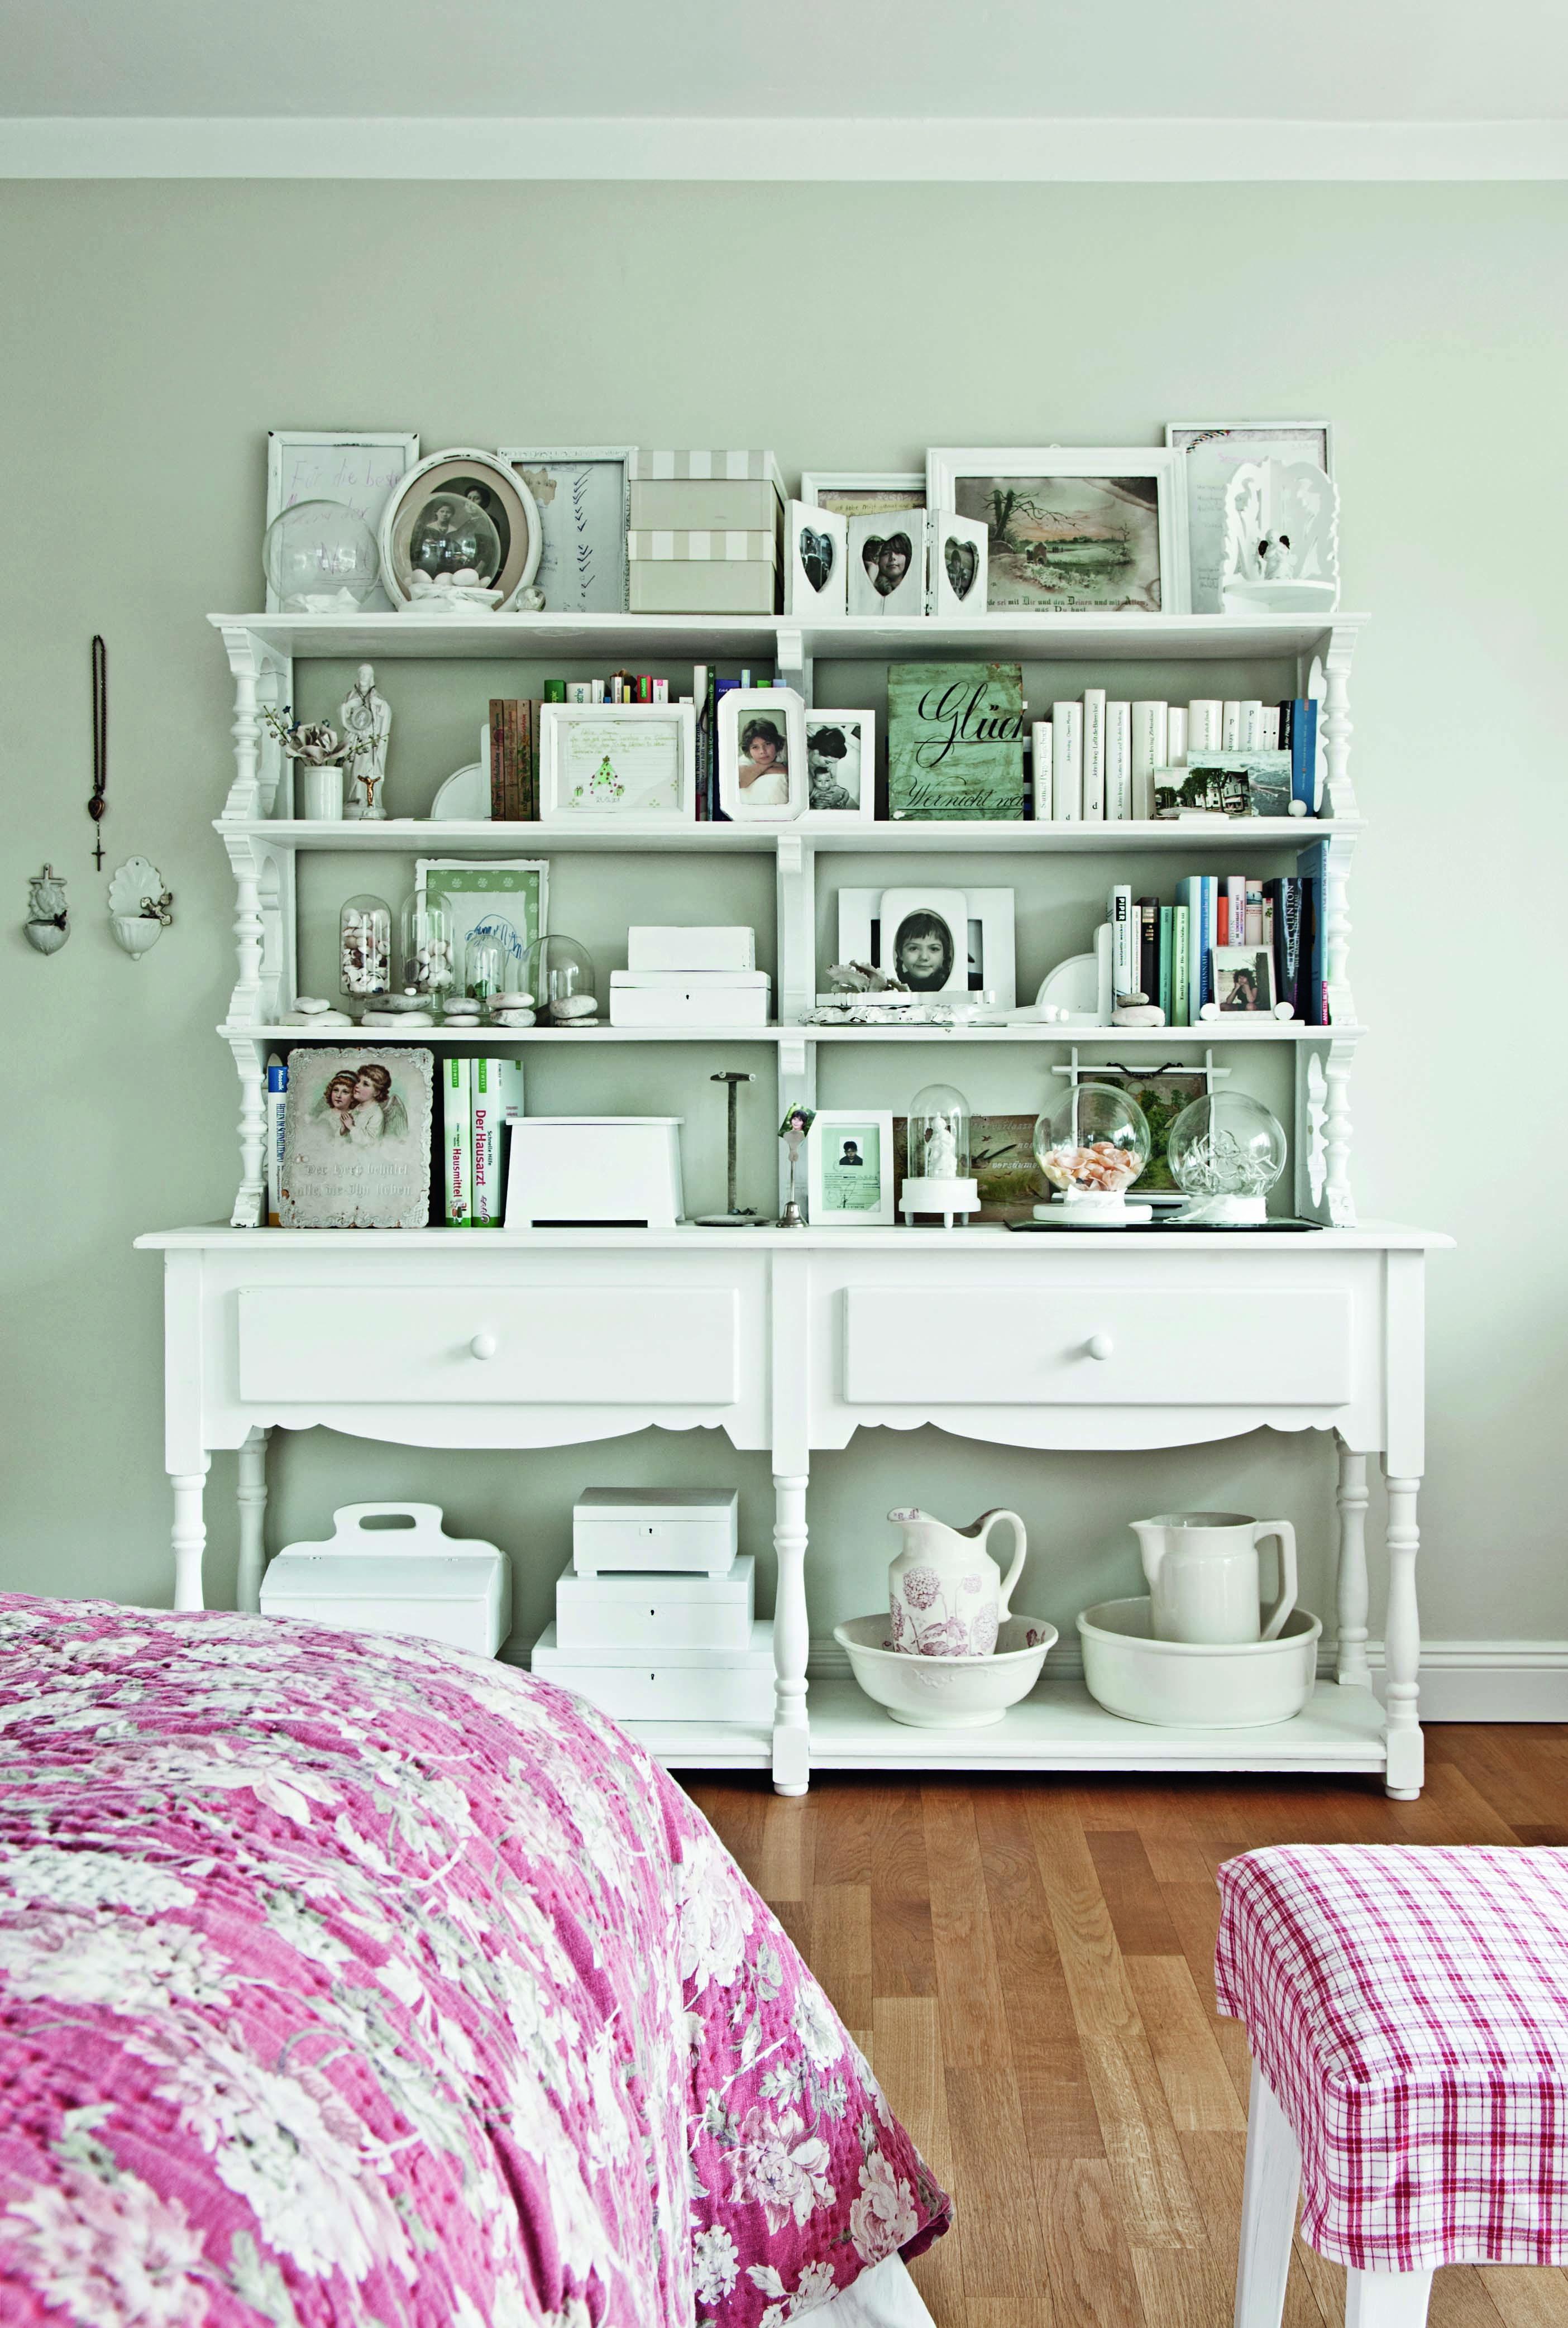 blog wohnen f r die seele. Black Bedroom Furniture Sets. Home Design Ideas